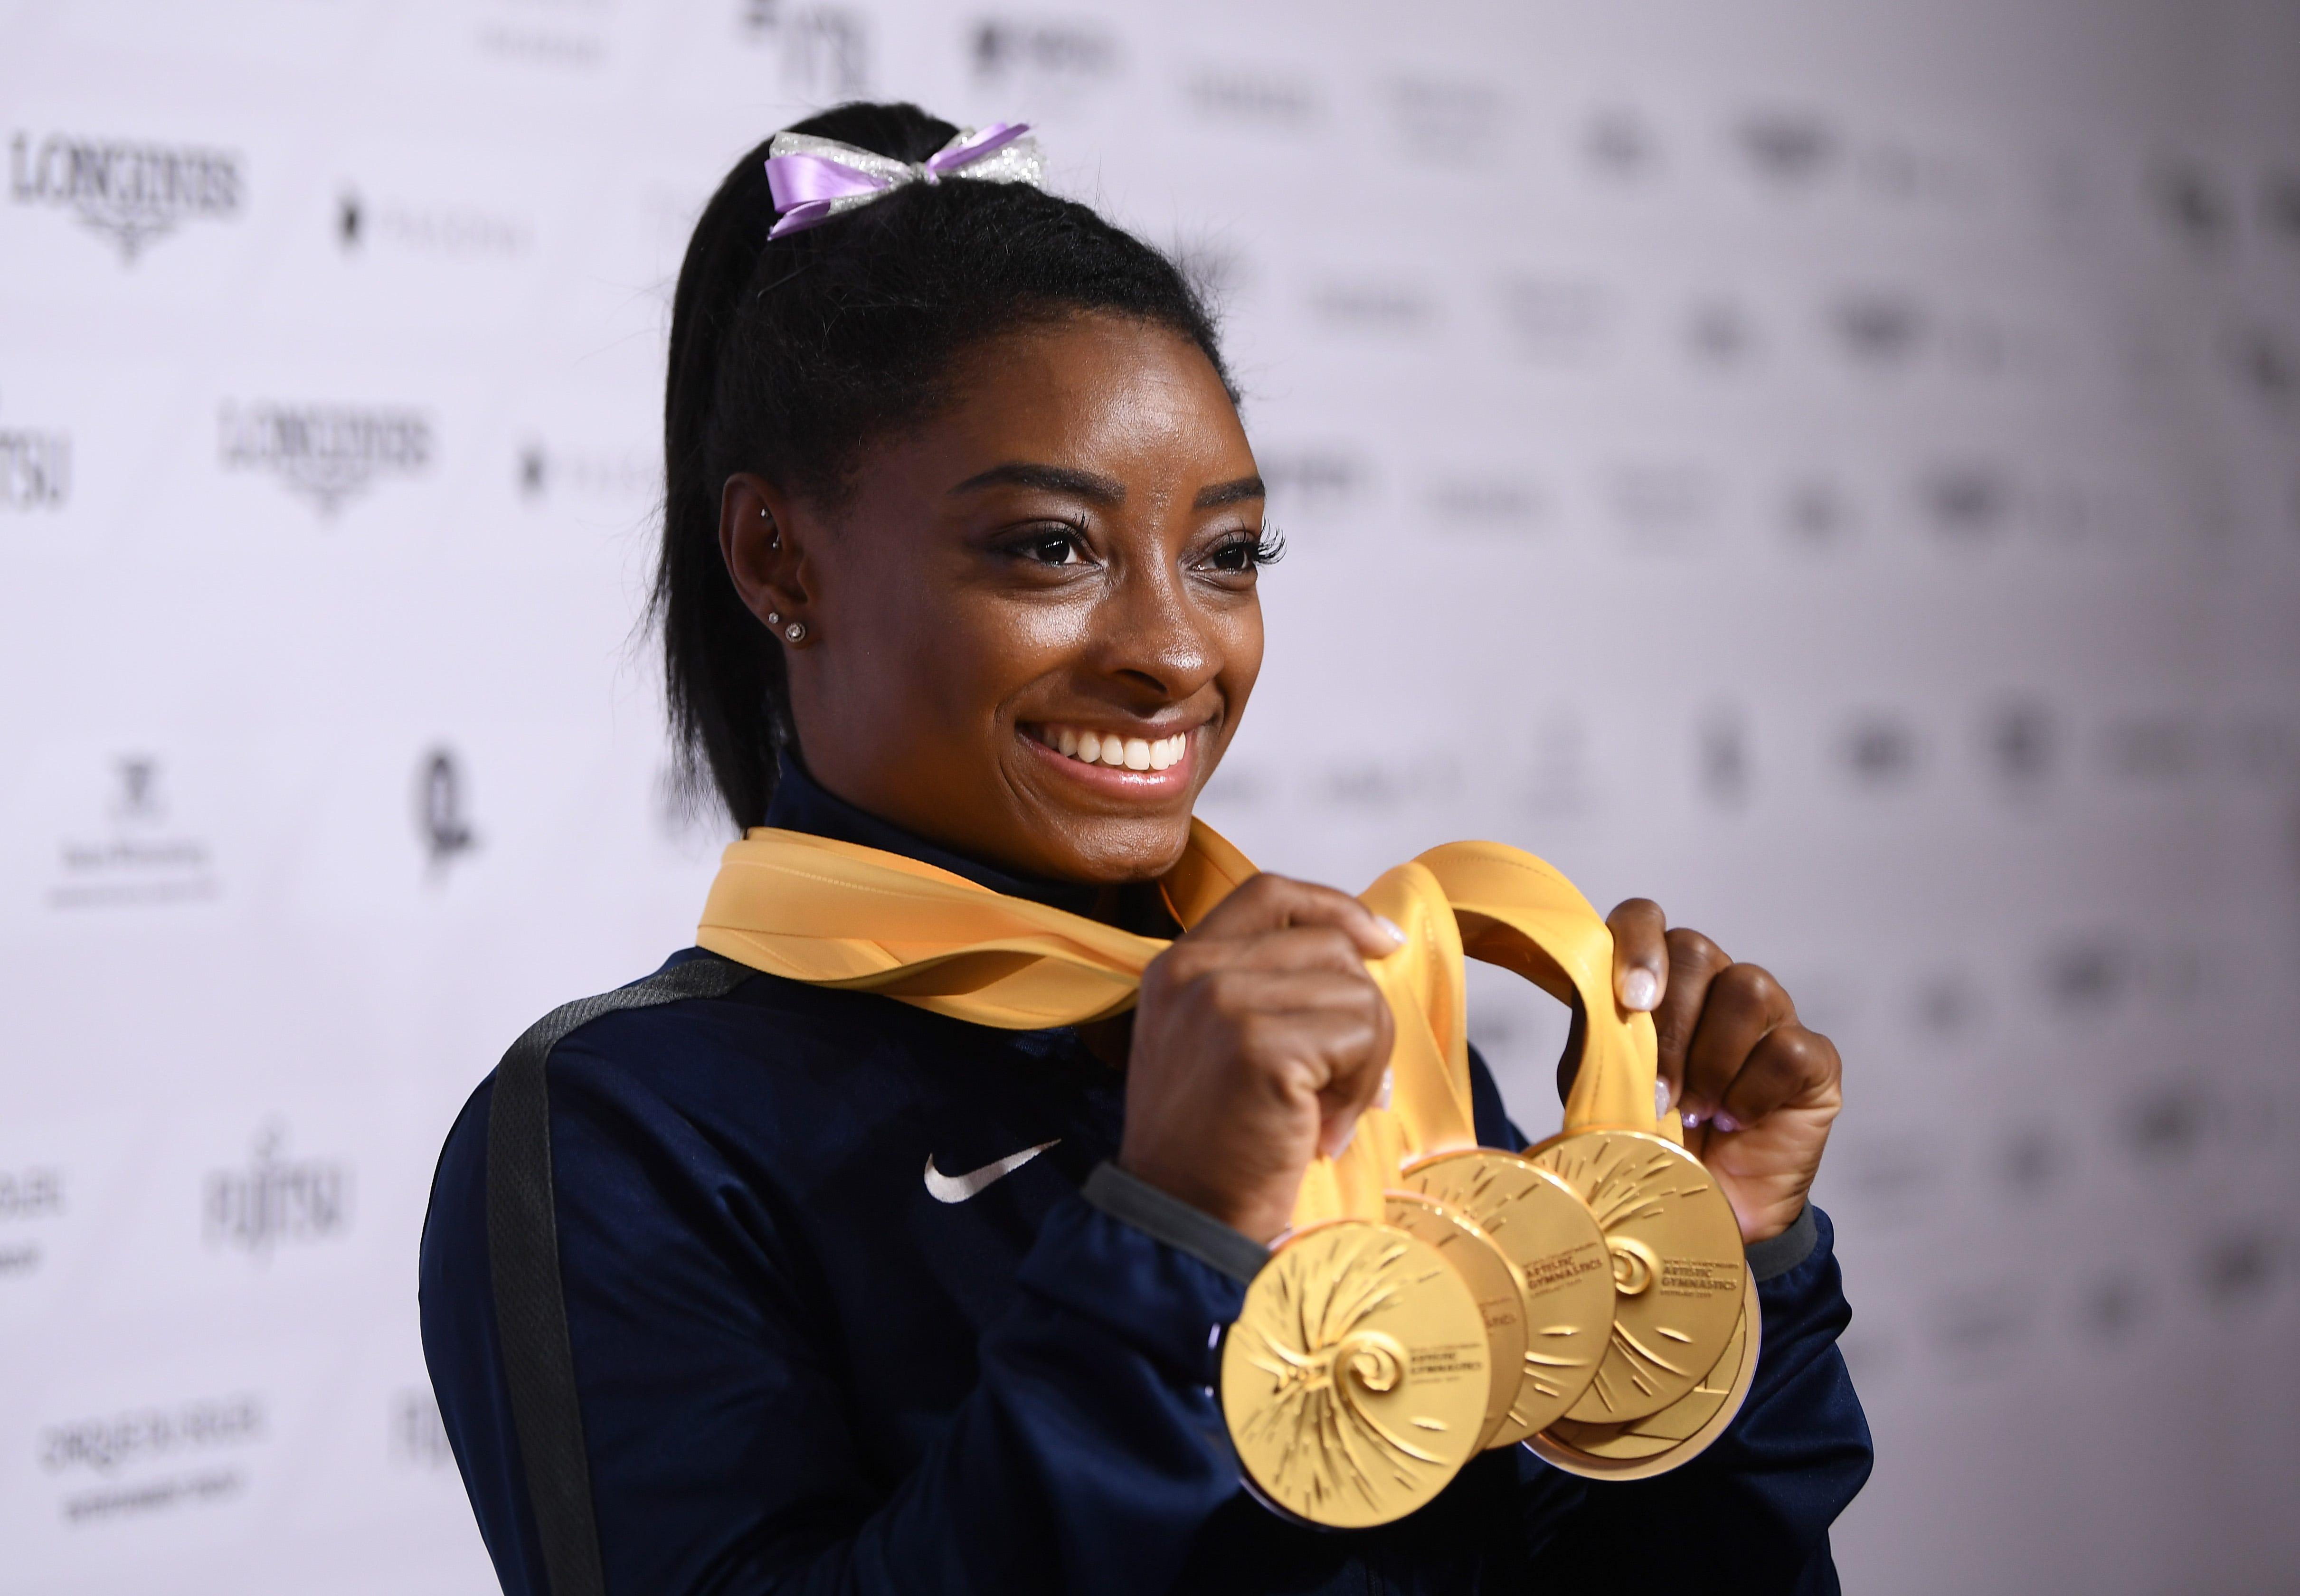 Opinion: Simone Biles follows Michael Phelps, Usain Bolt as Olympic icons